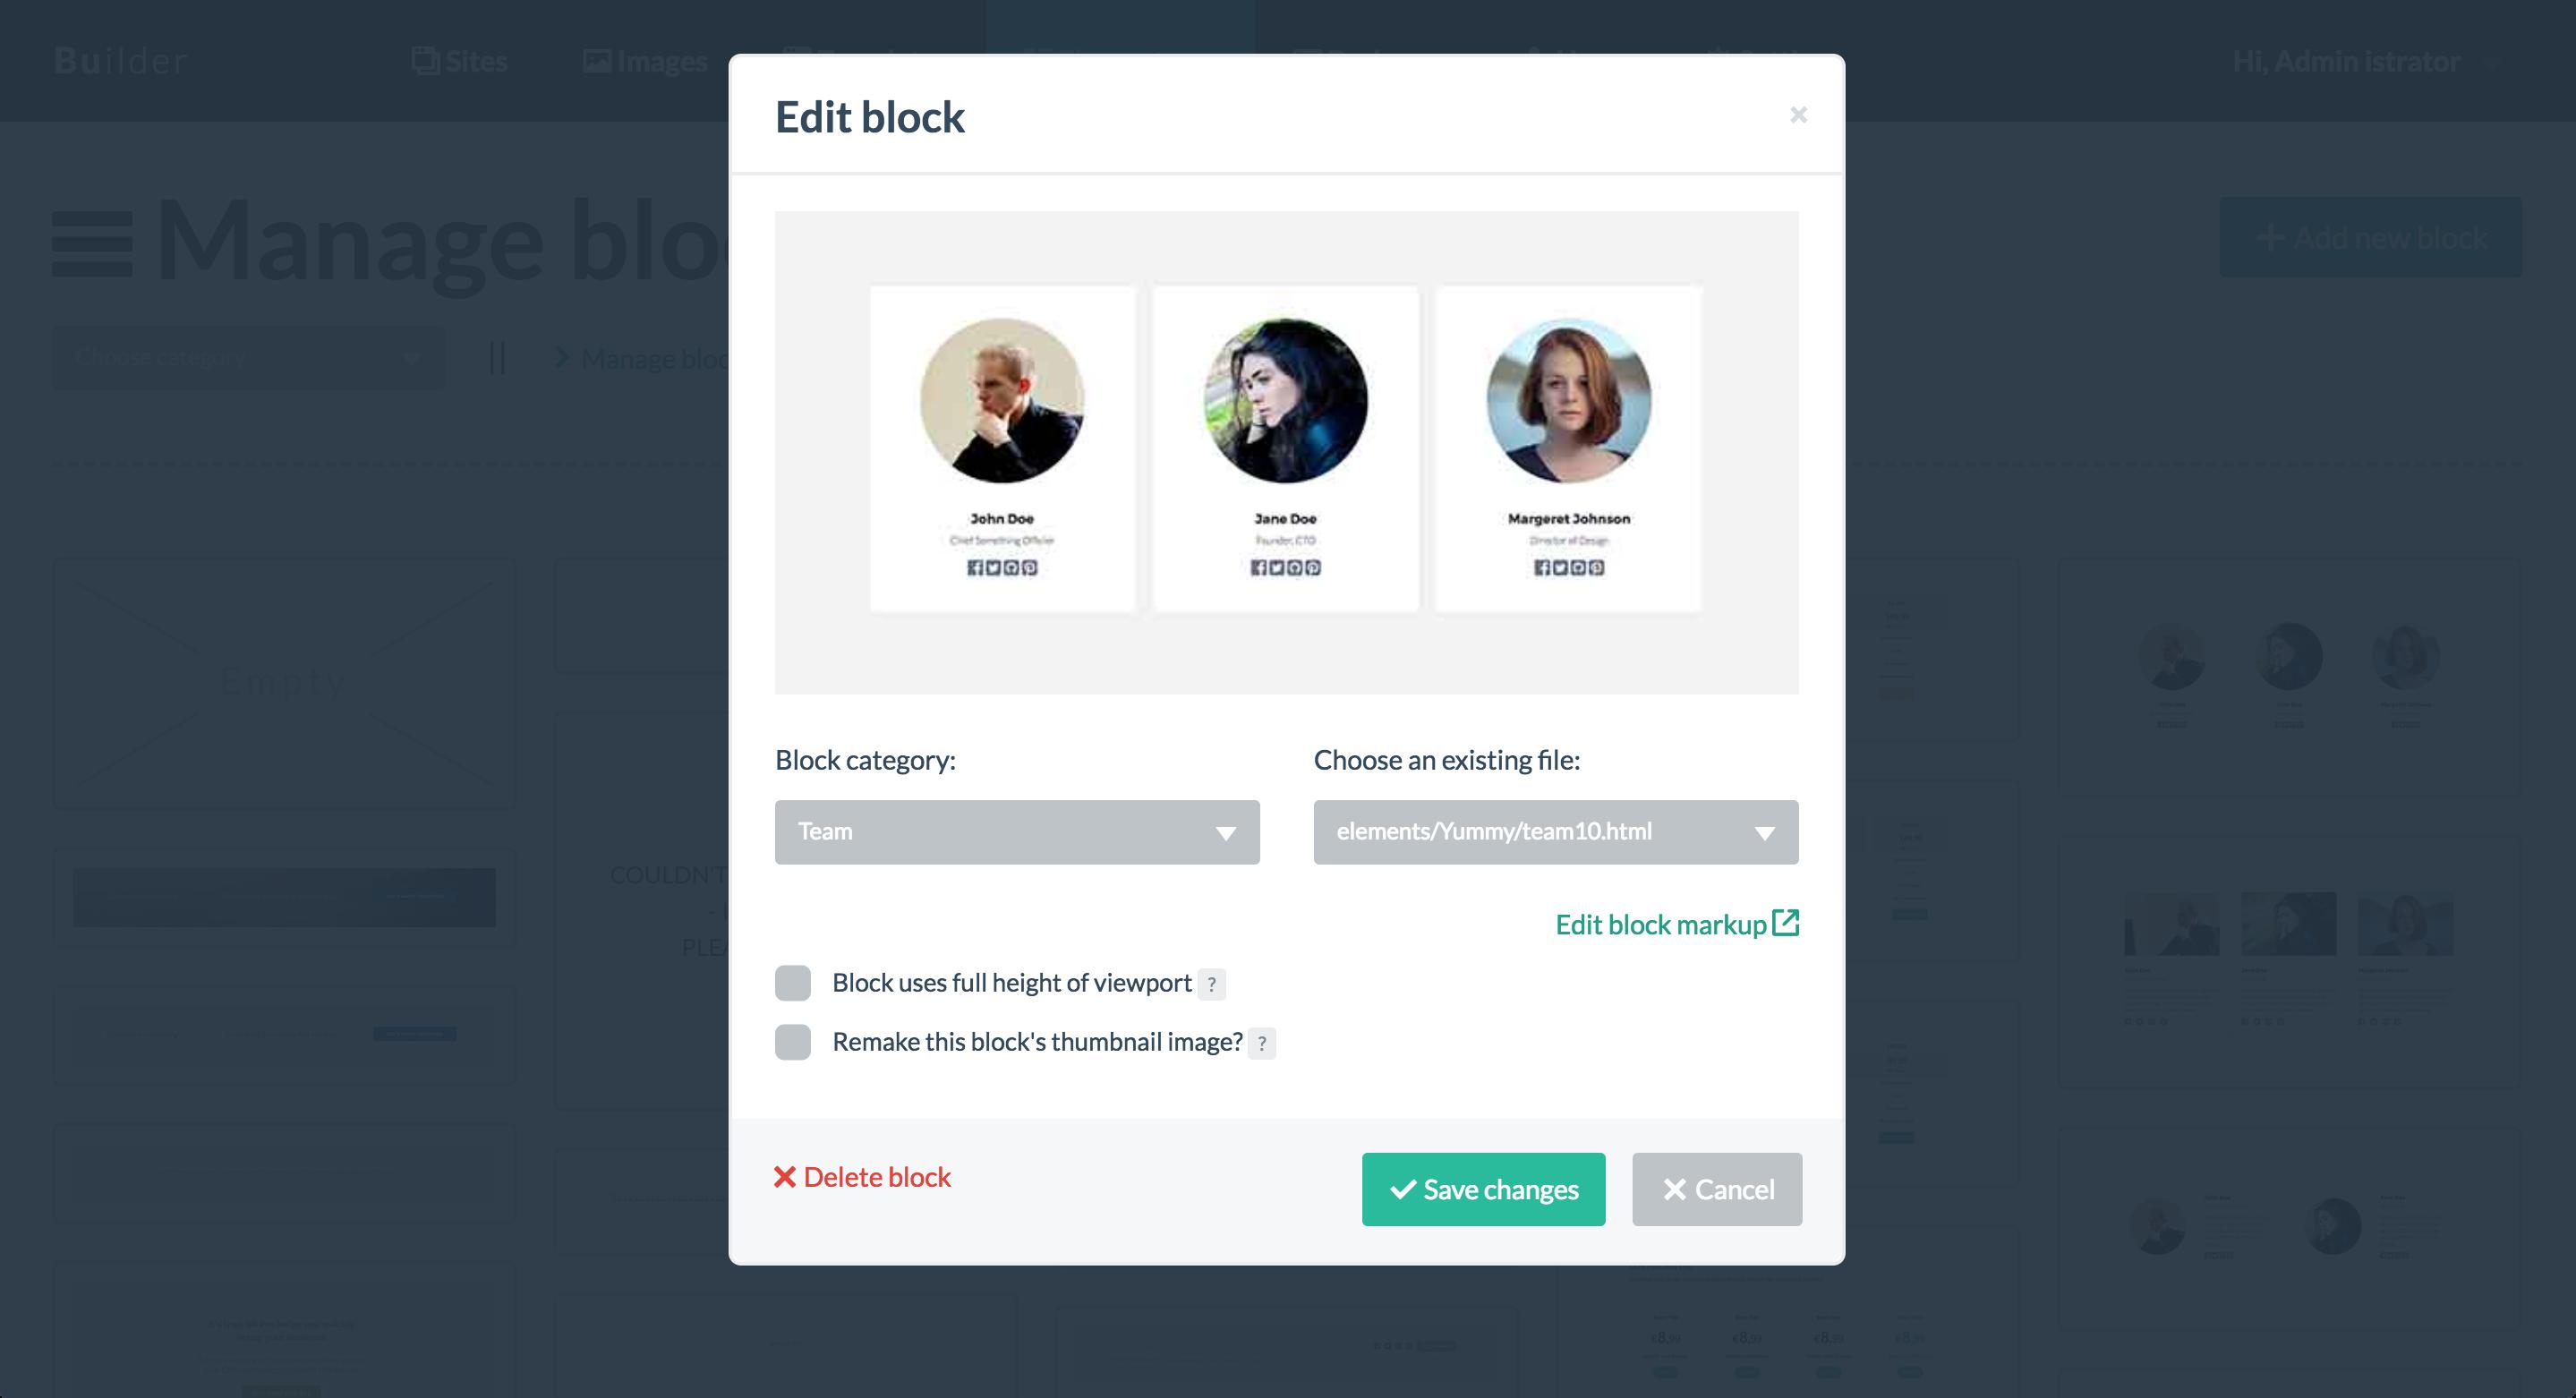 Bloxby Edit Block